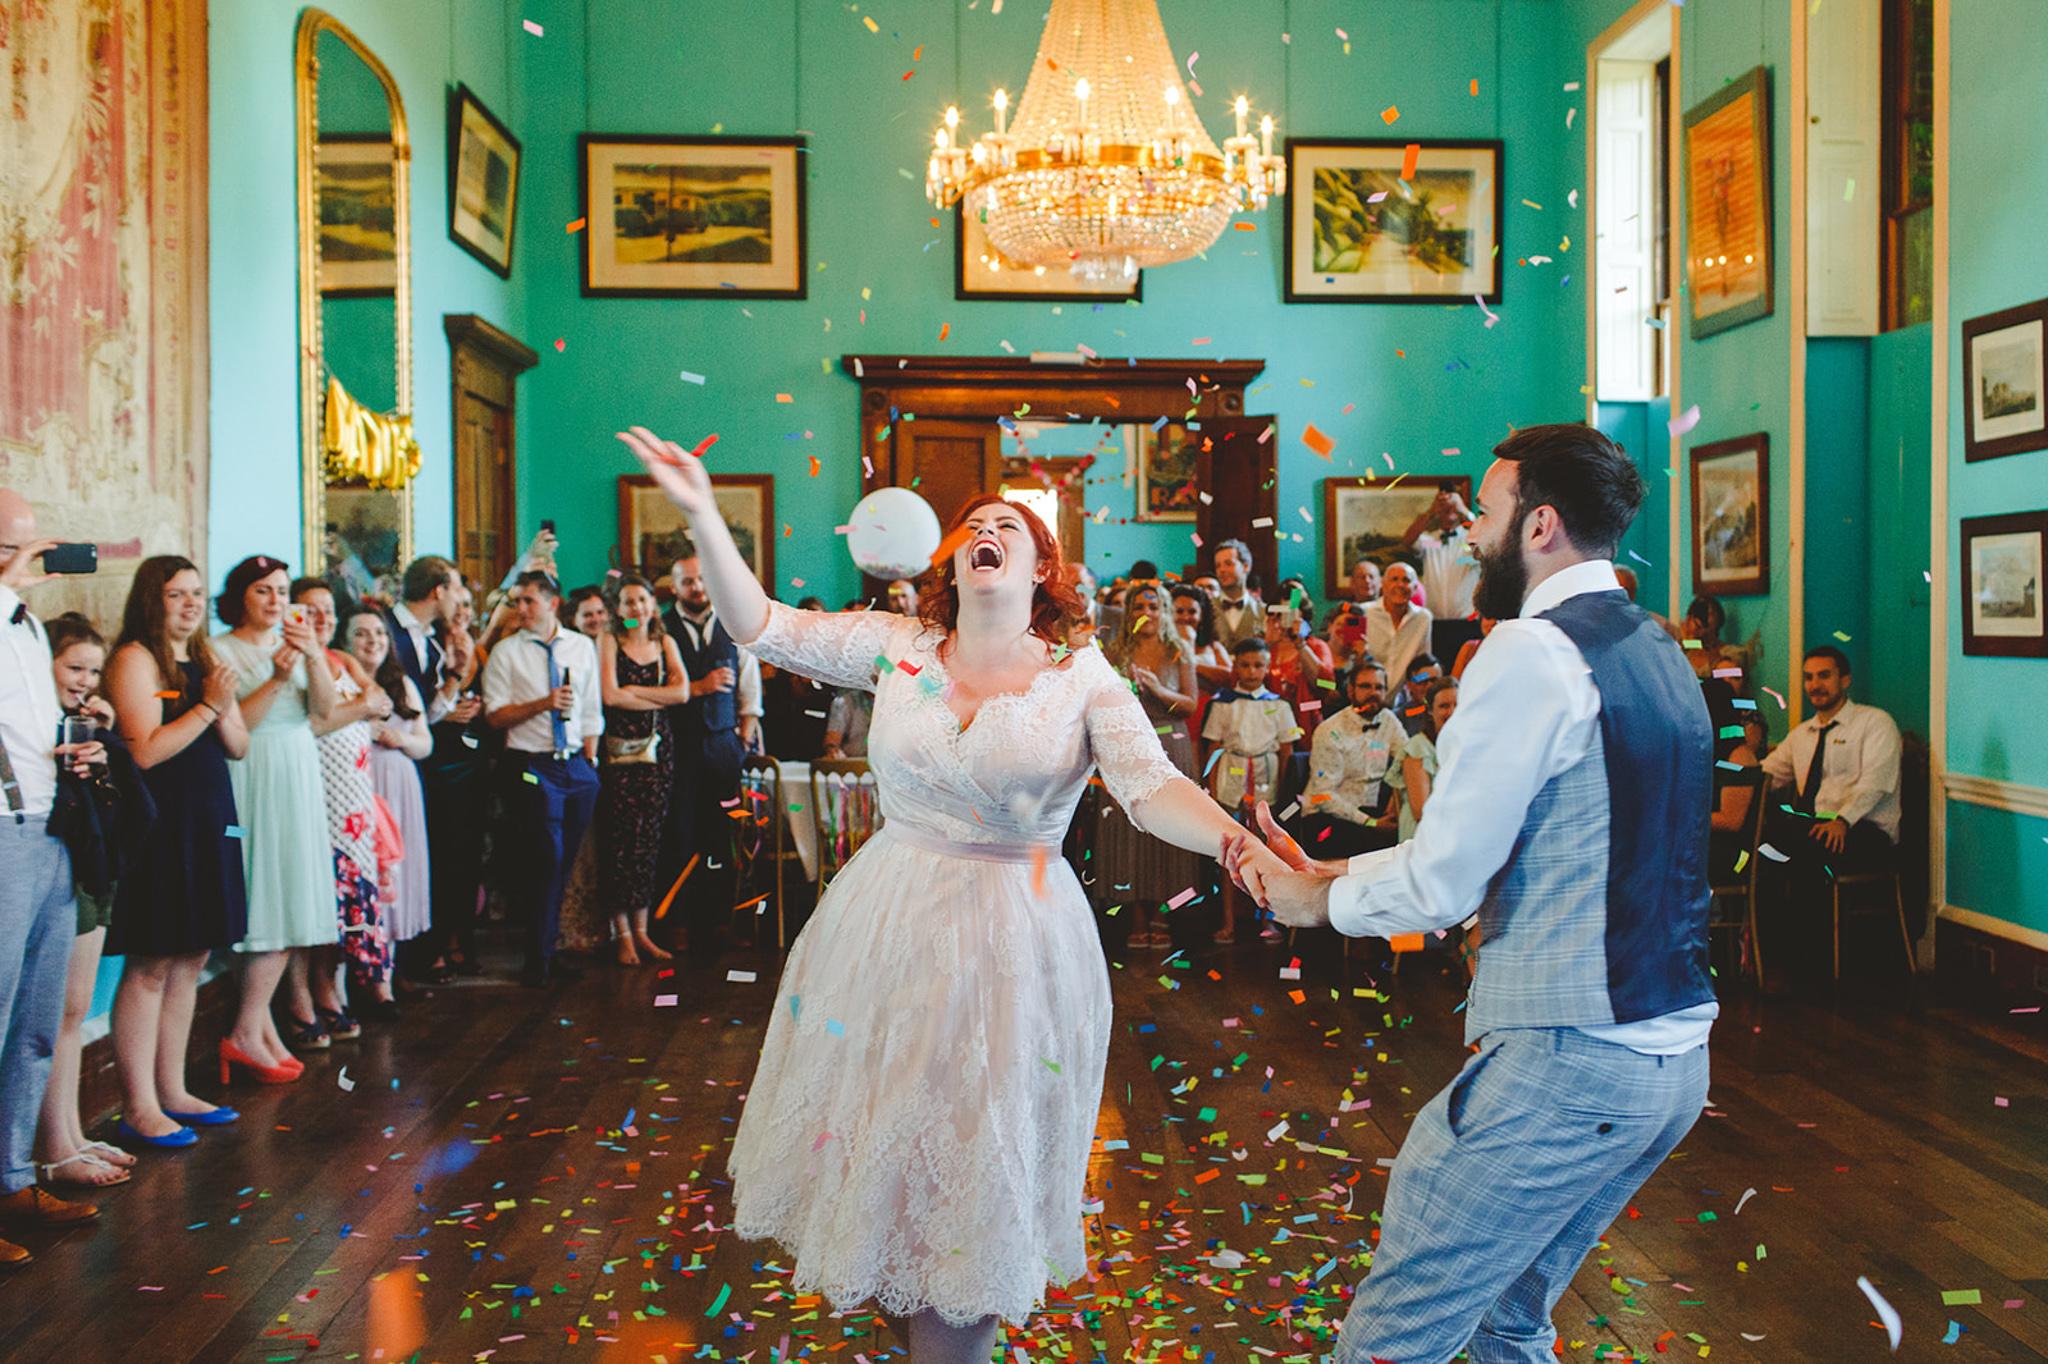 derbyshire-wedding-photographer-videographer-camera-hannah-87.jpg